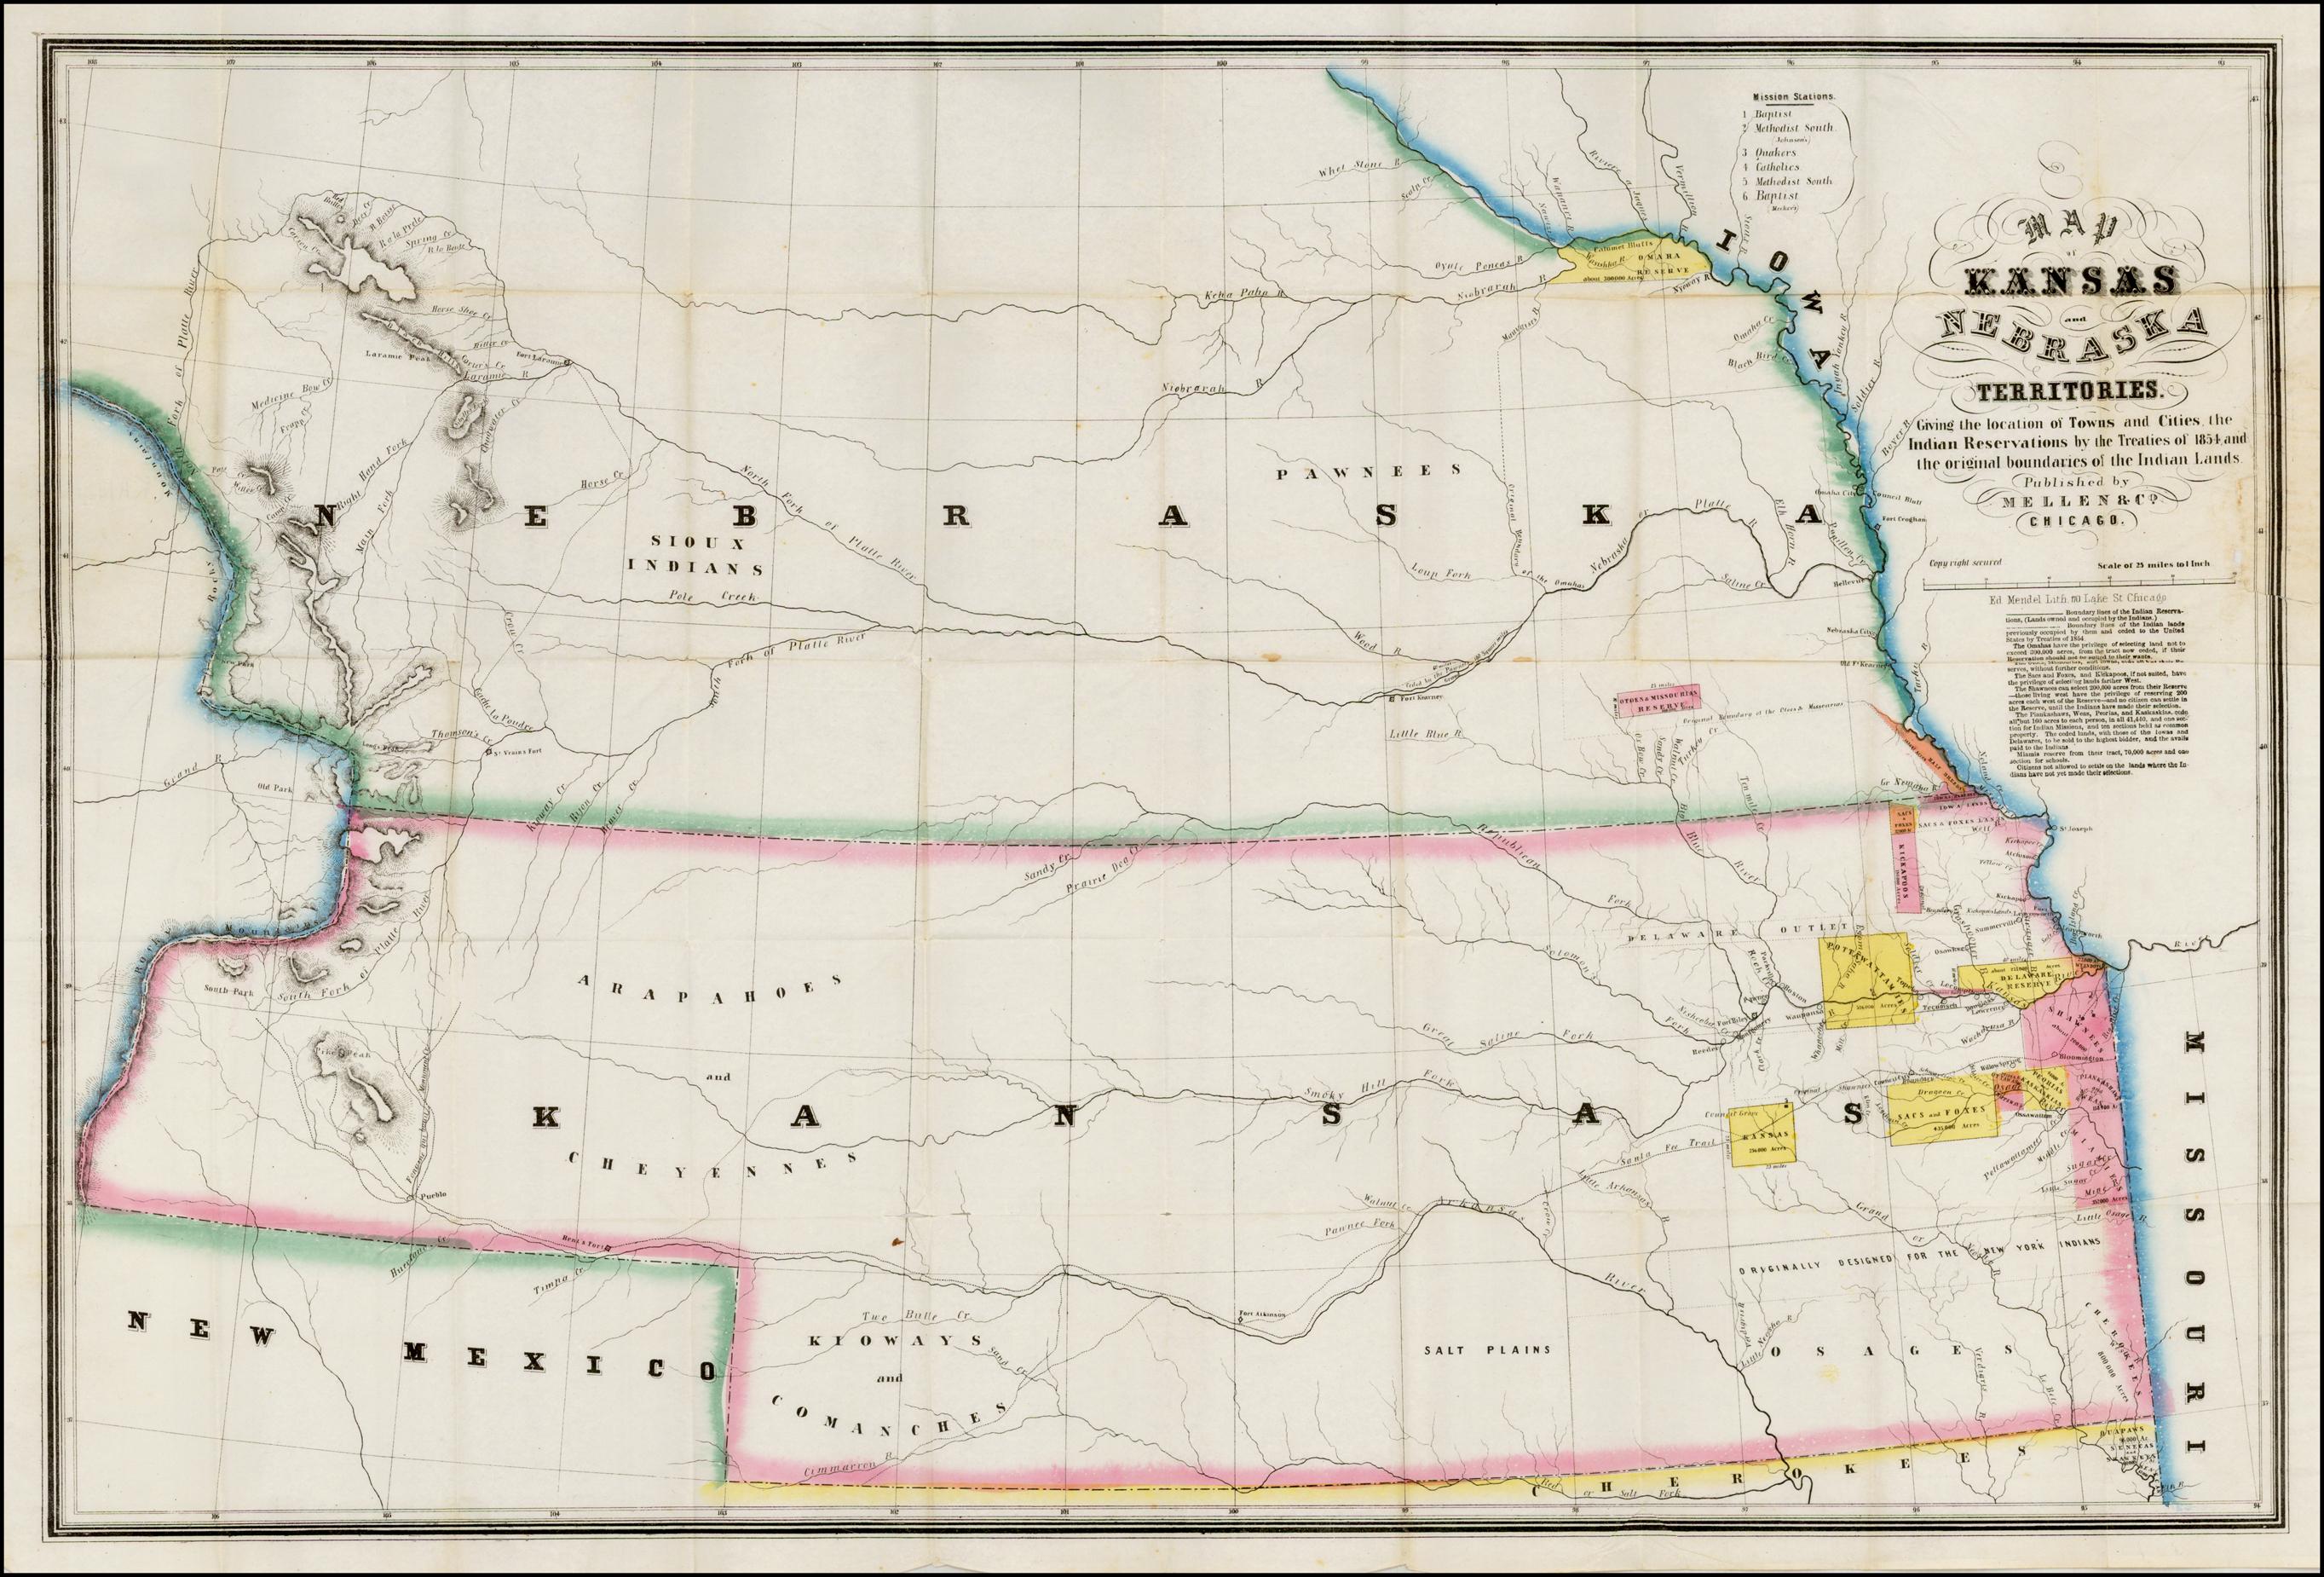 map of kansas and nebraska territories. giving the location